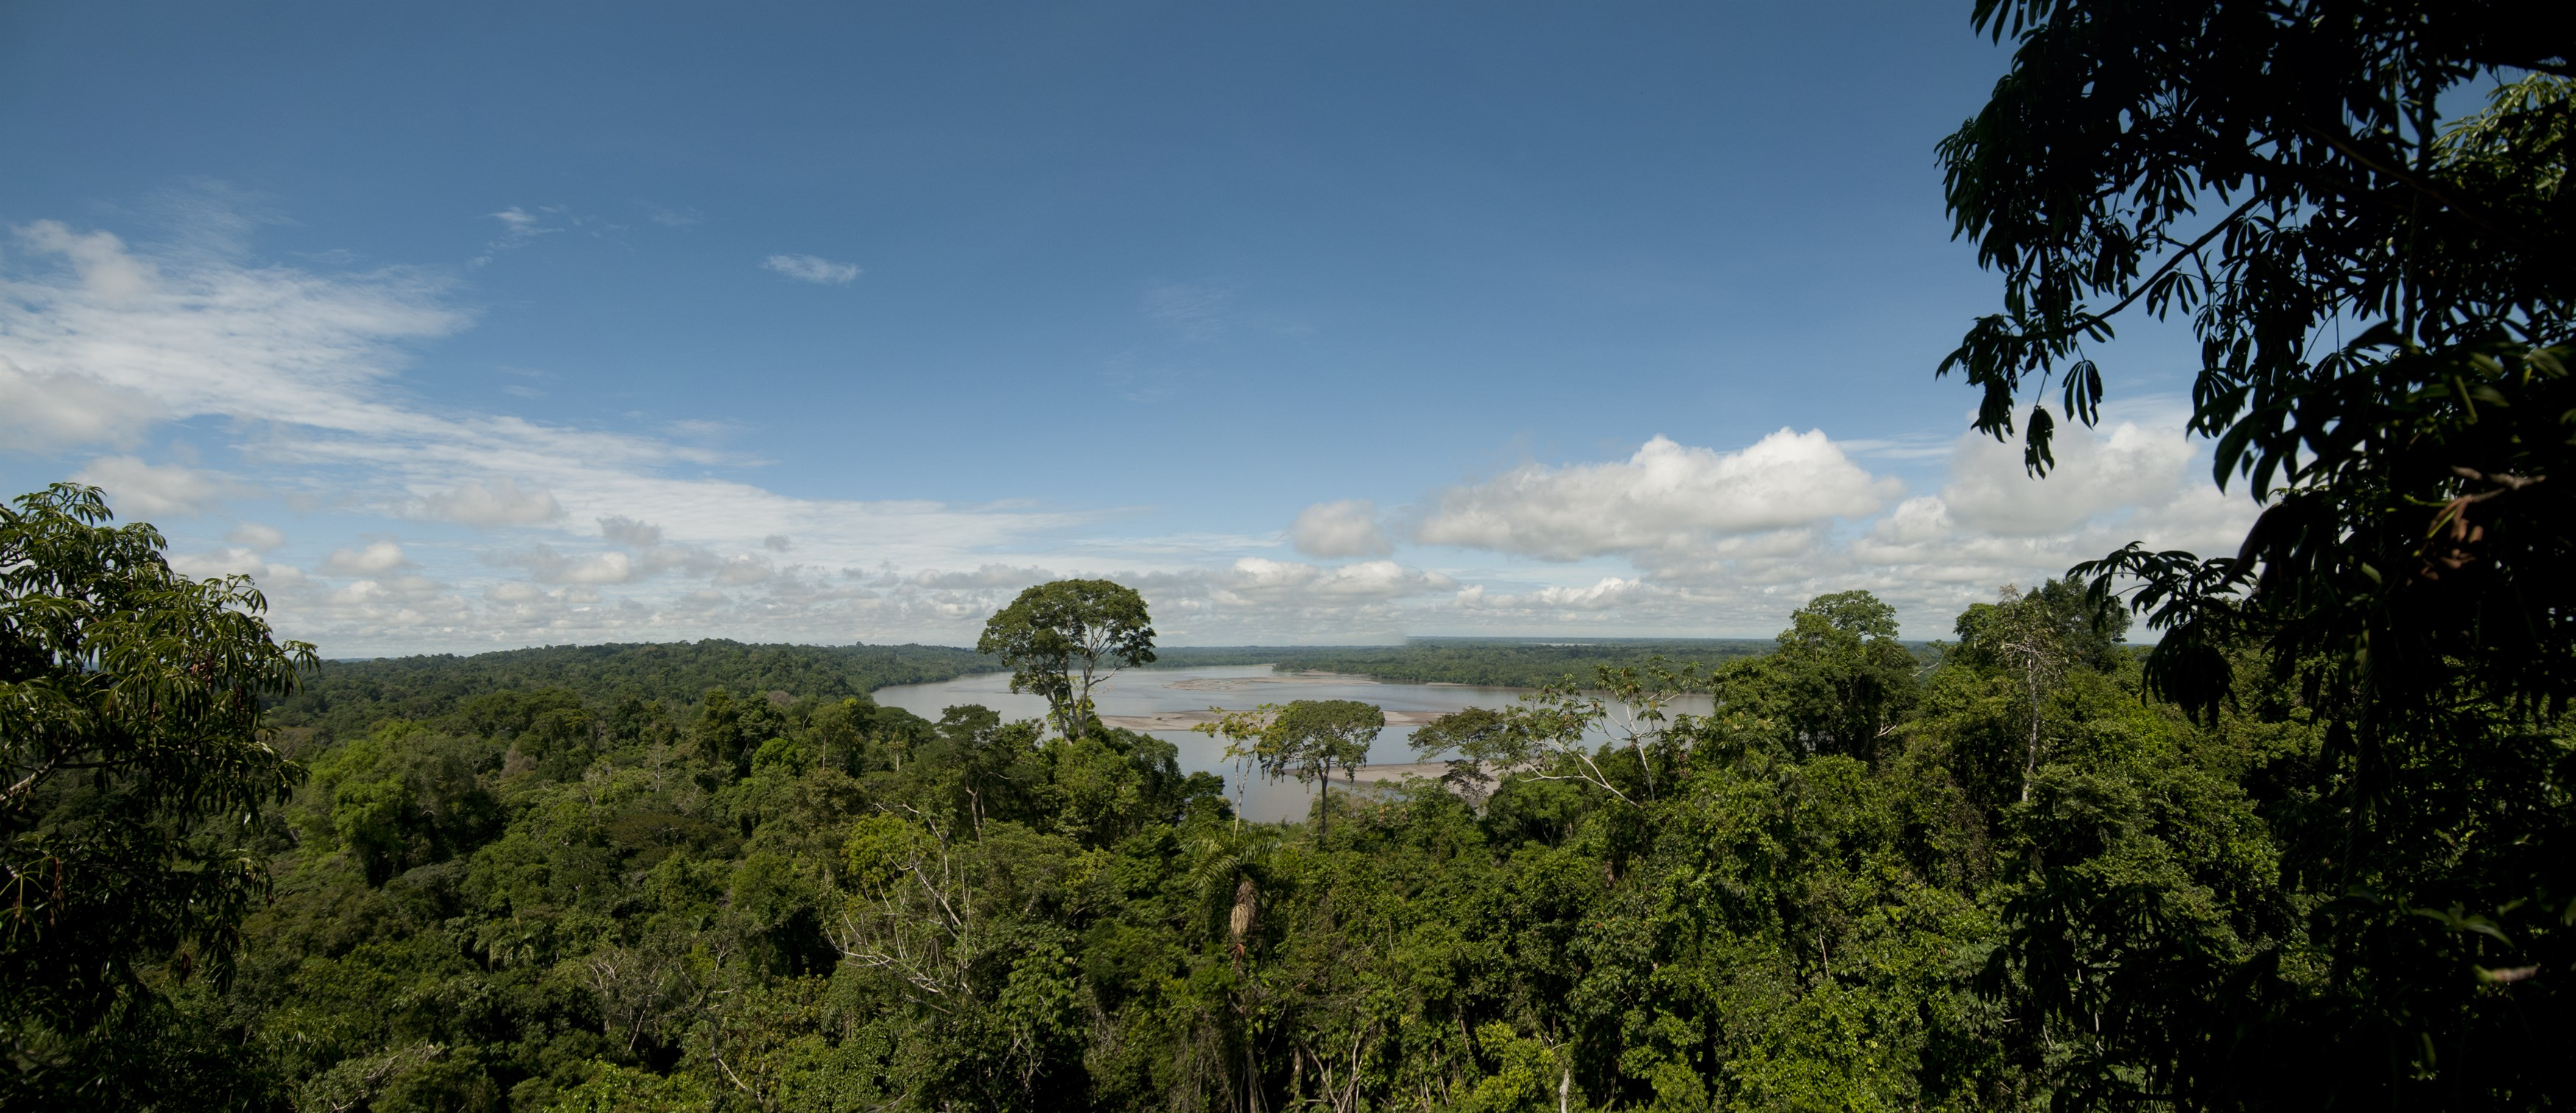 napo-river-yasuni-national-park-ecuador_fabc-3500x1512px